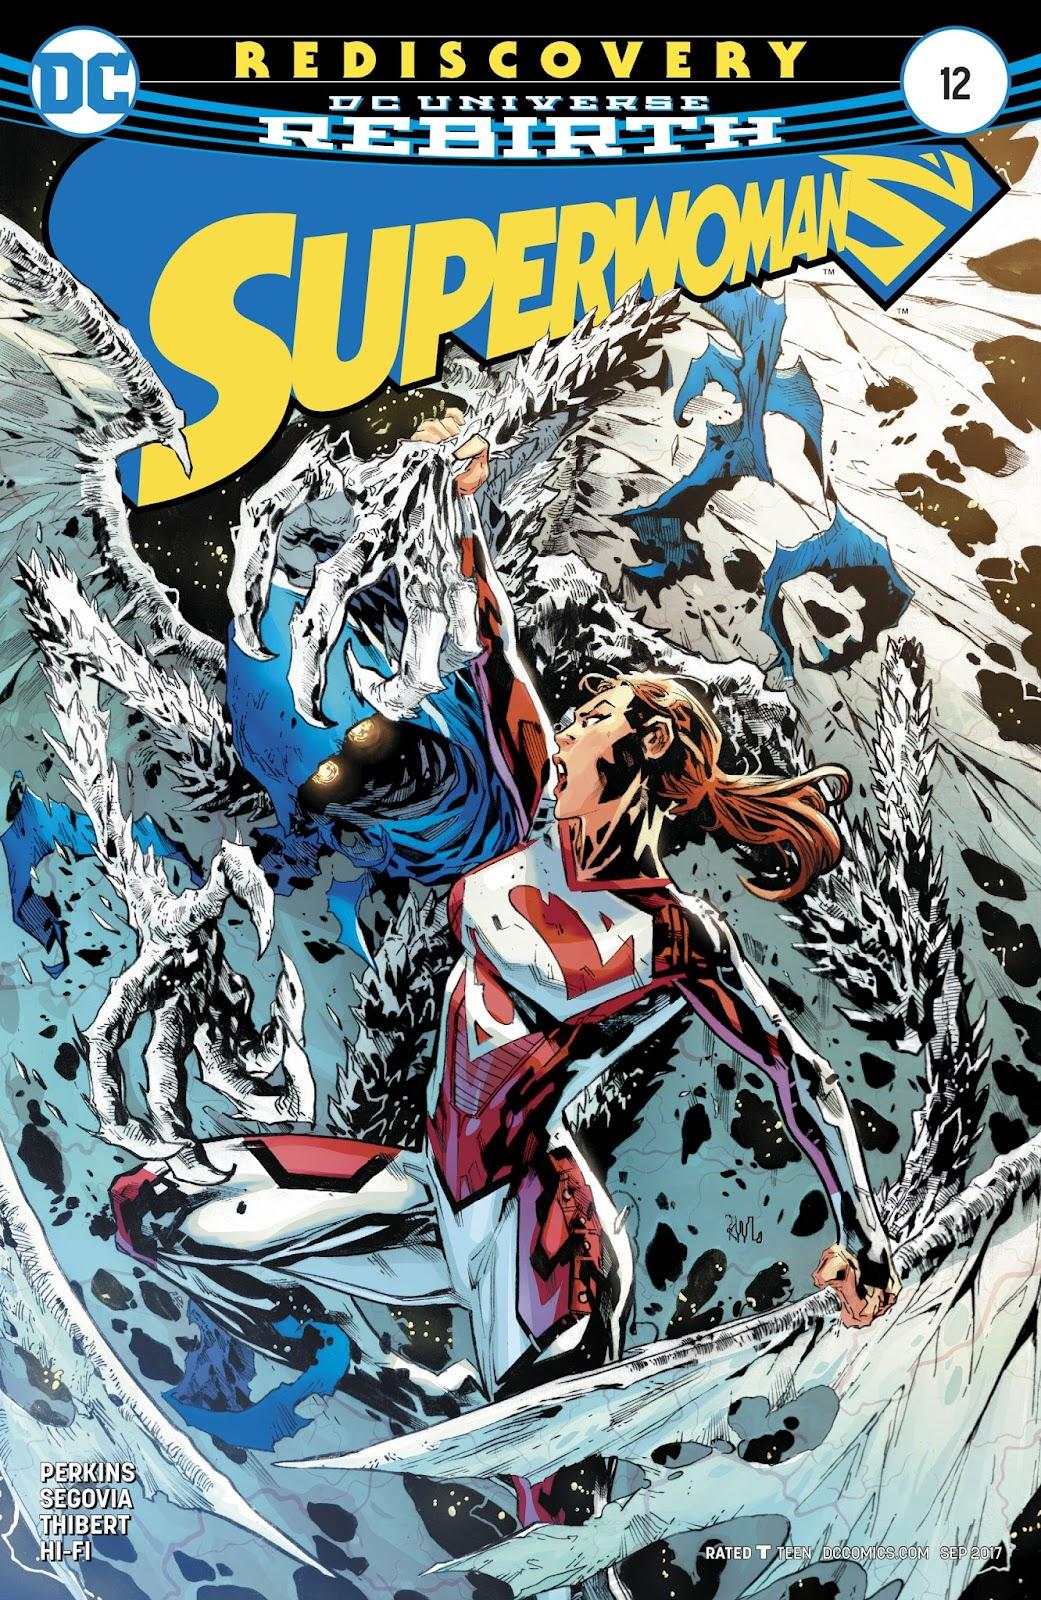 Read online Superwoman comic -  Issue #12 - 1